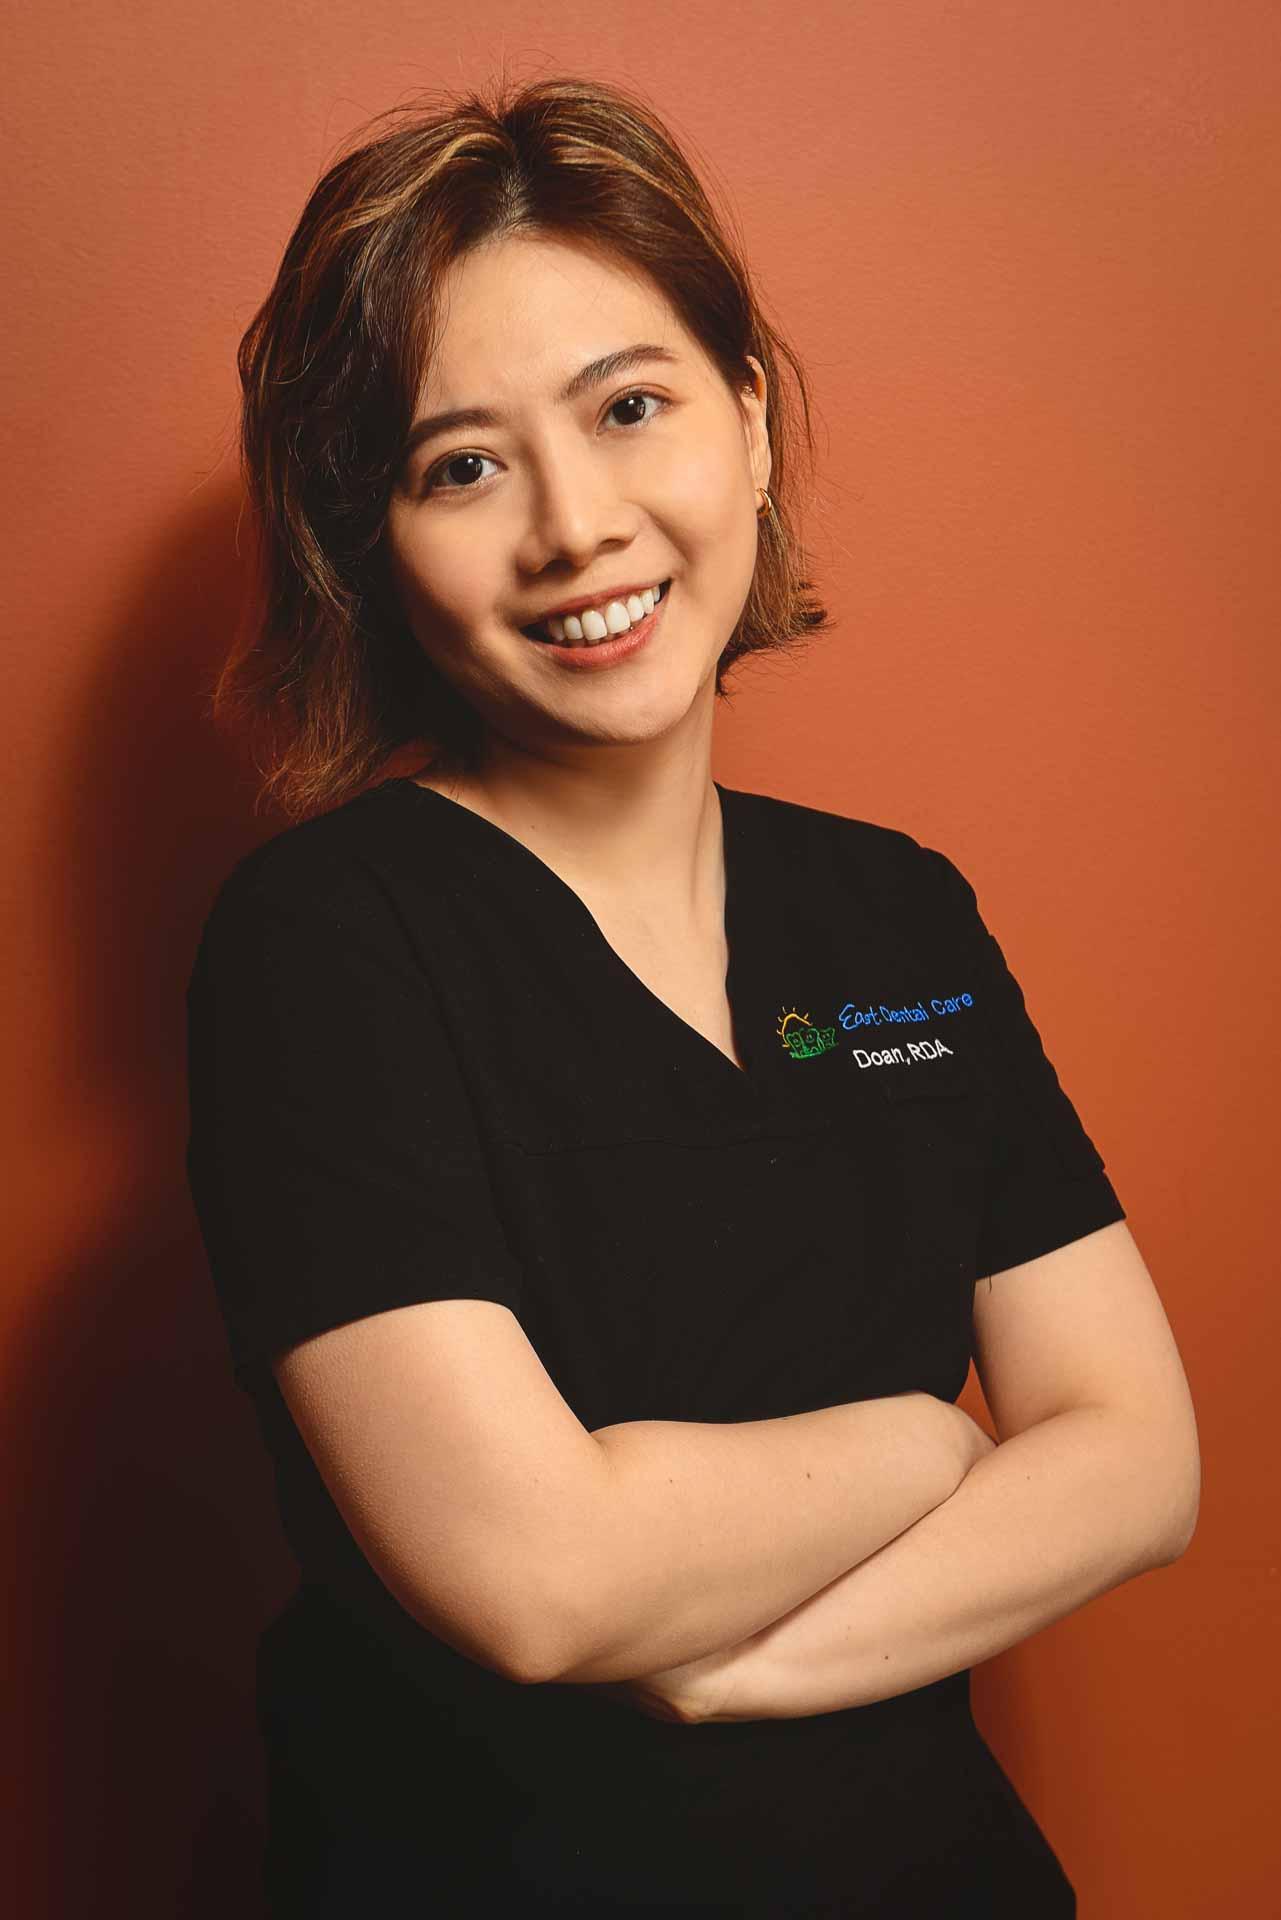 Doan | East Dental Care | SE Calgary Dentist | RDA